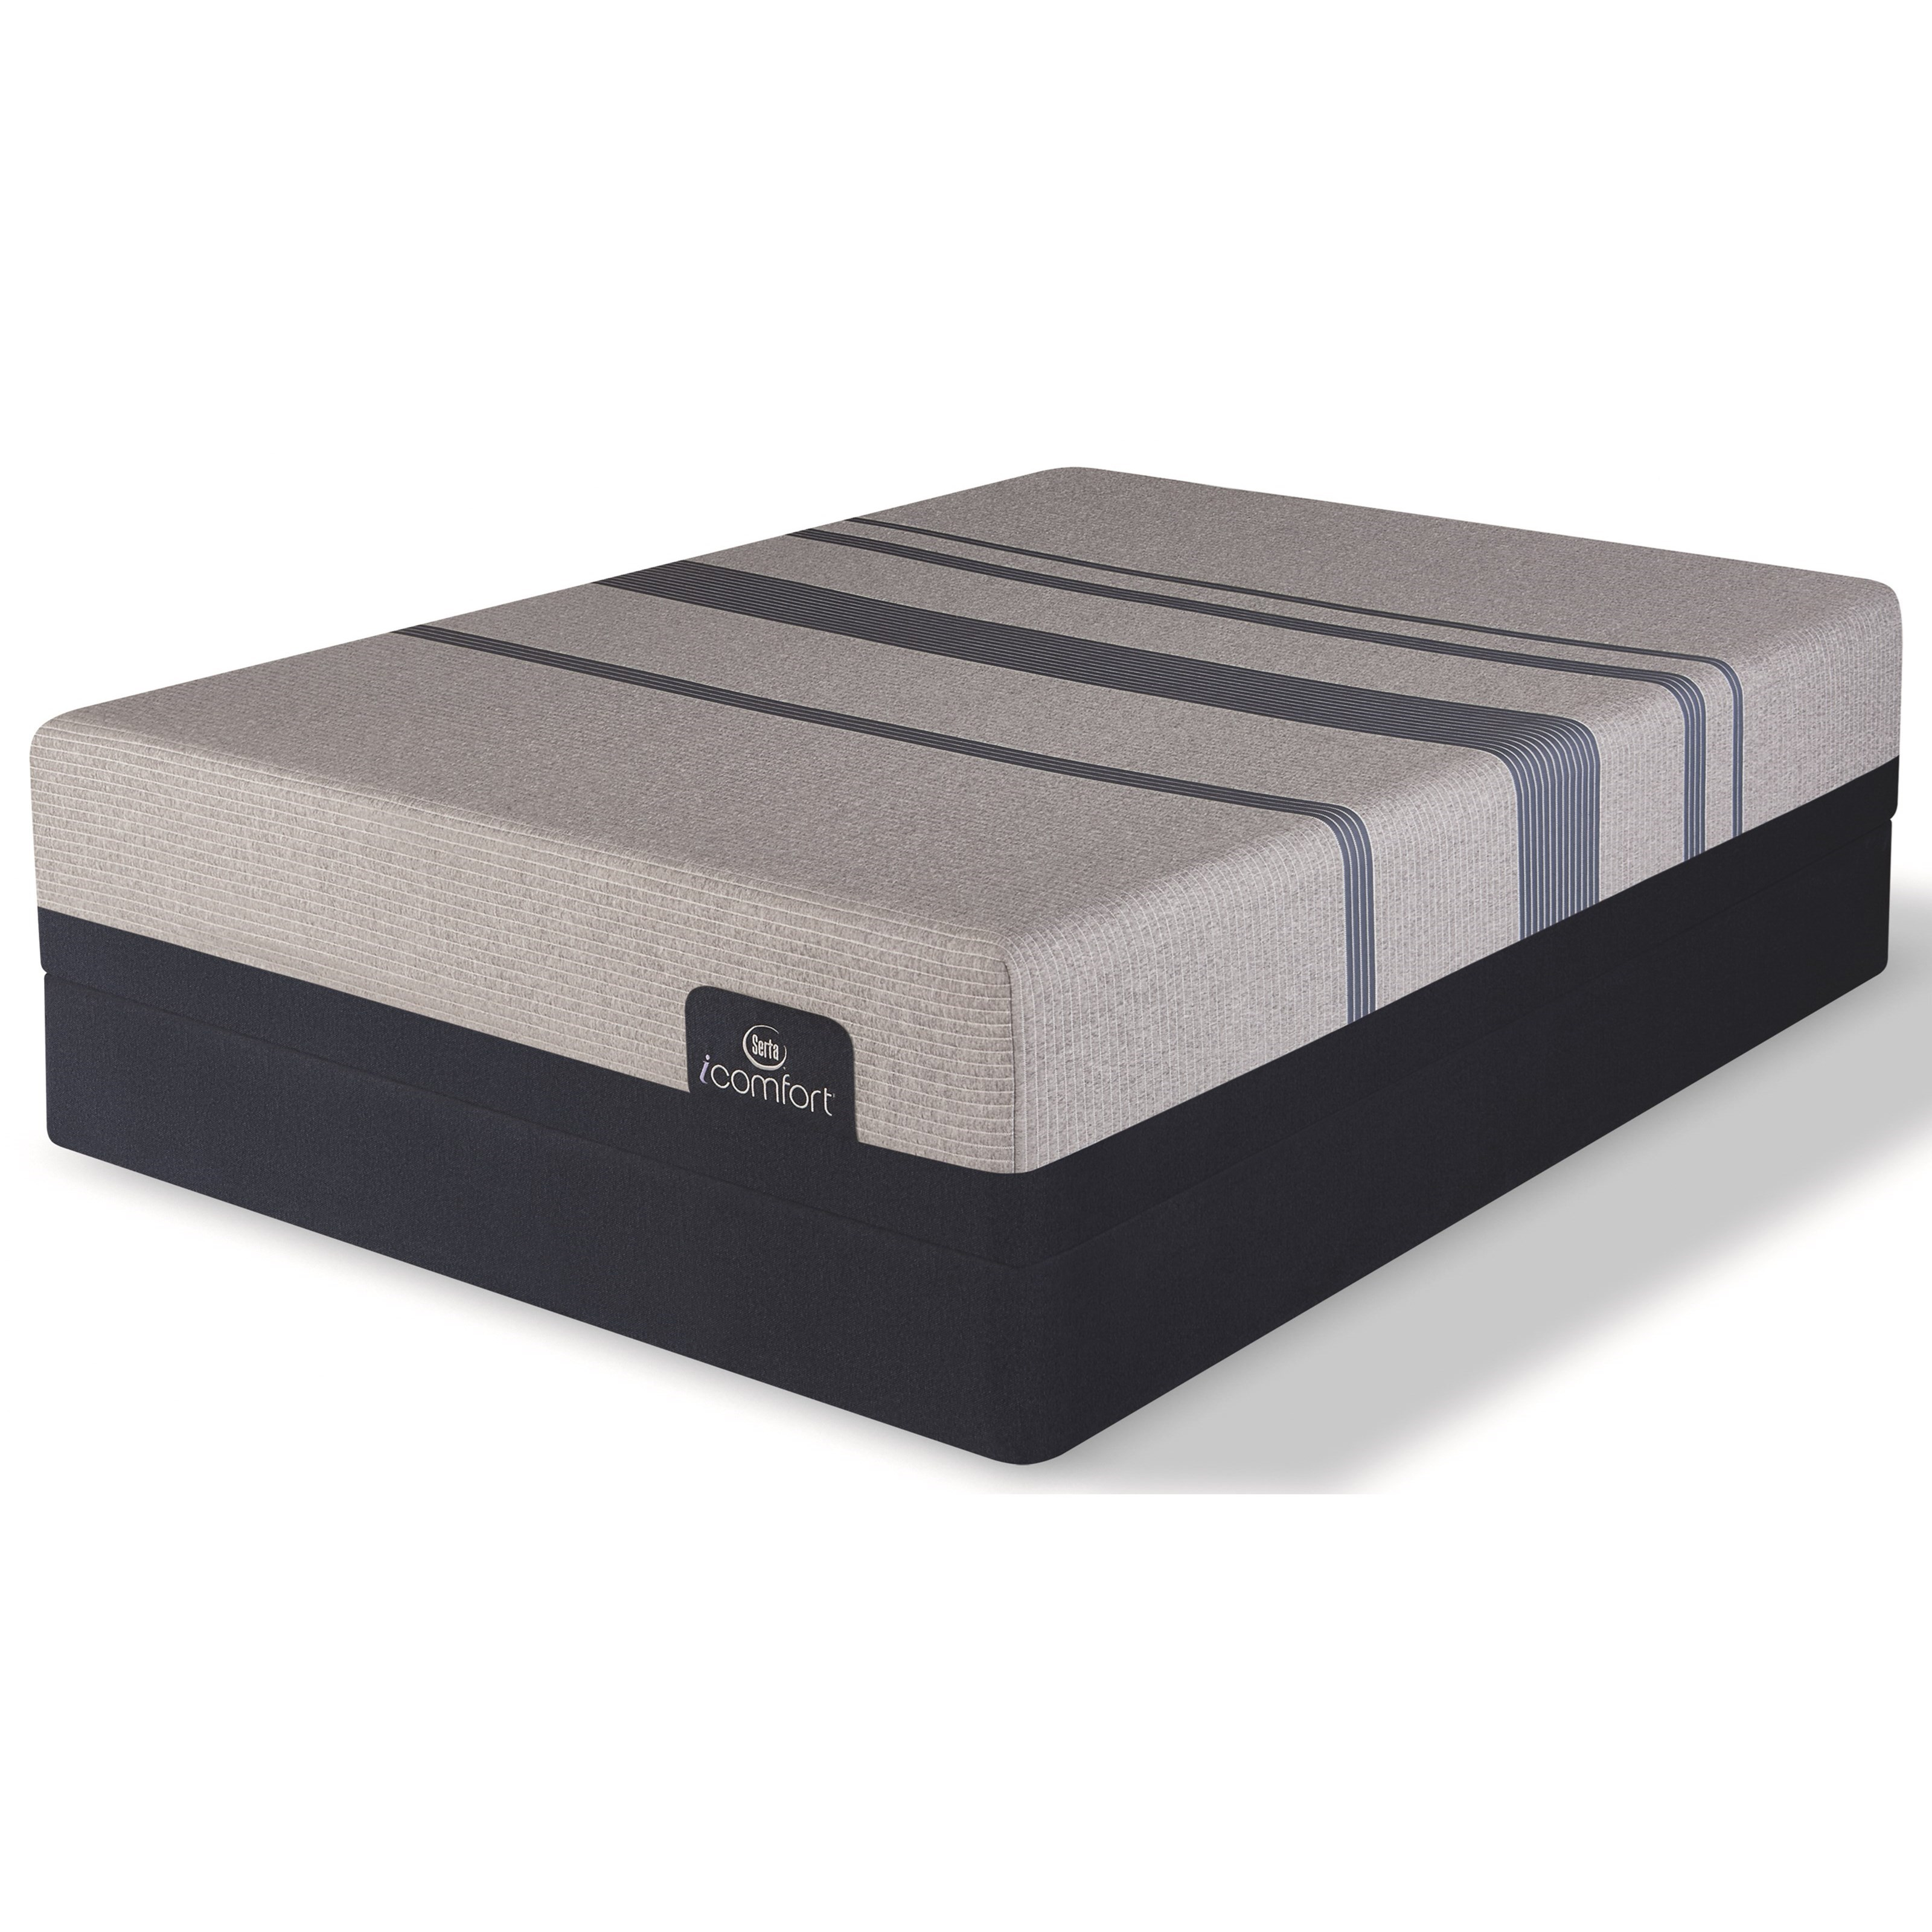 Serta iComfort Blue Max 1000 Cushion Firm Queen Cushion Firm Gel Memory Foam LP Set - Item Number: 500801268-1050+500800199-6050